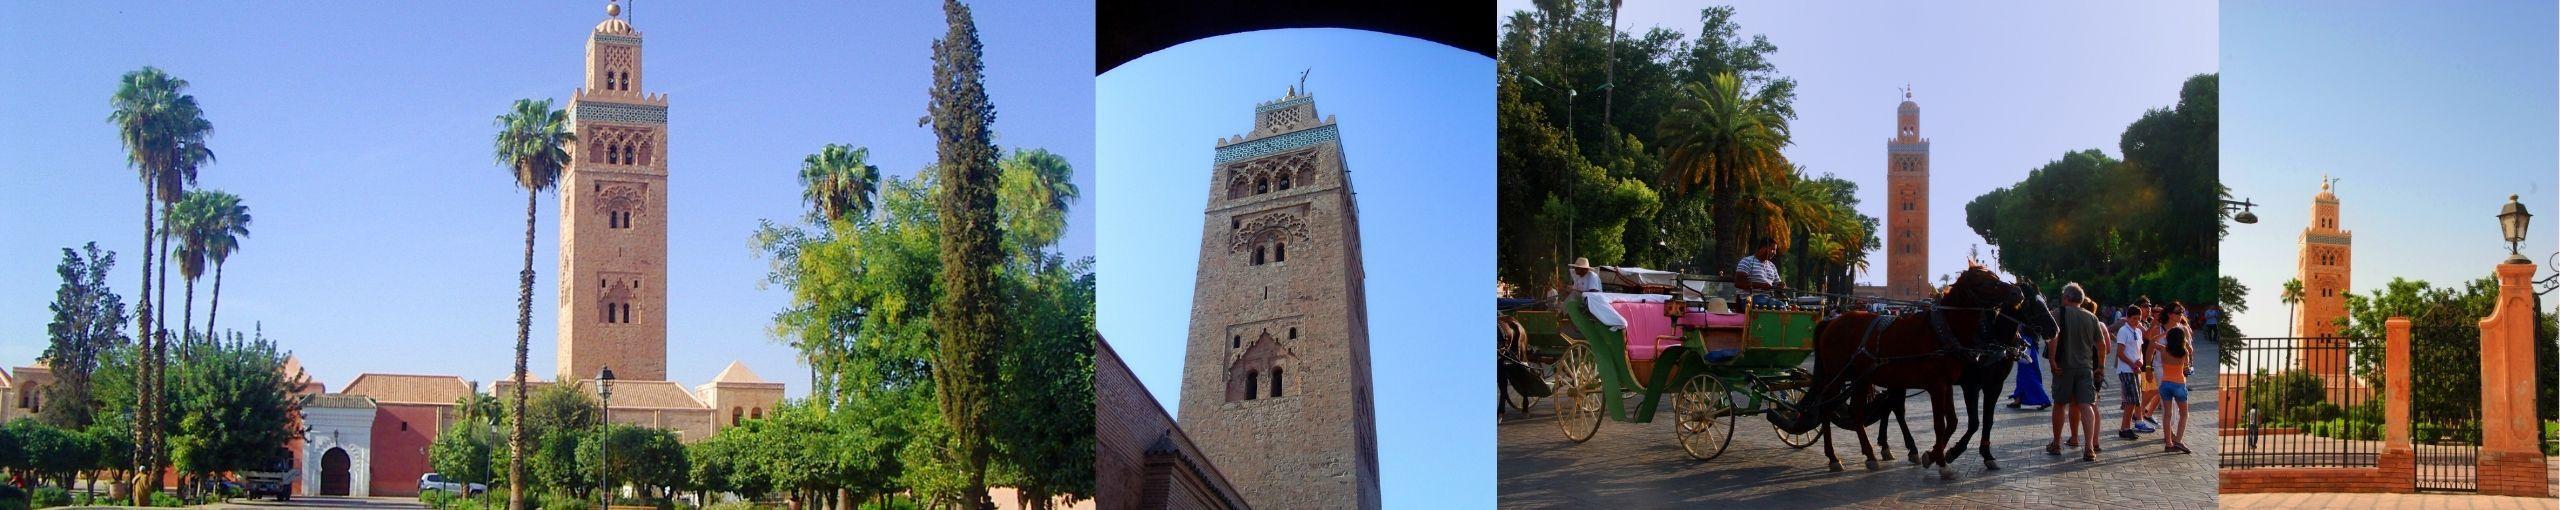 Mezquita de la Koutoubia. Marrakech, Marruecos.